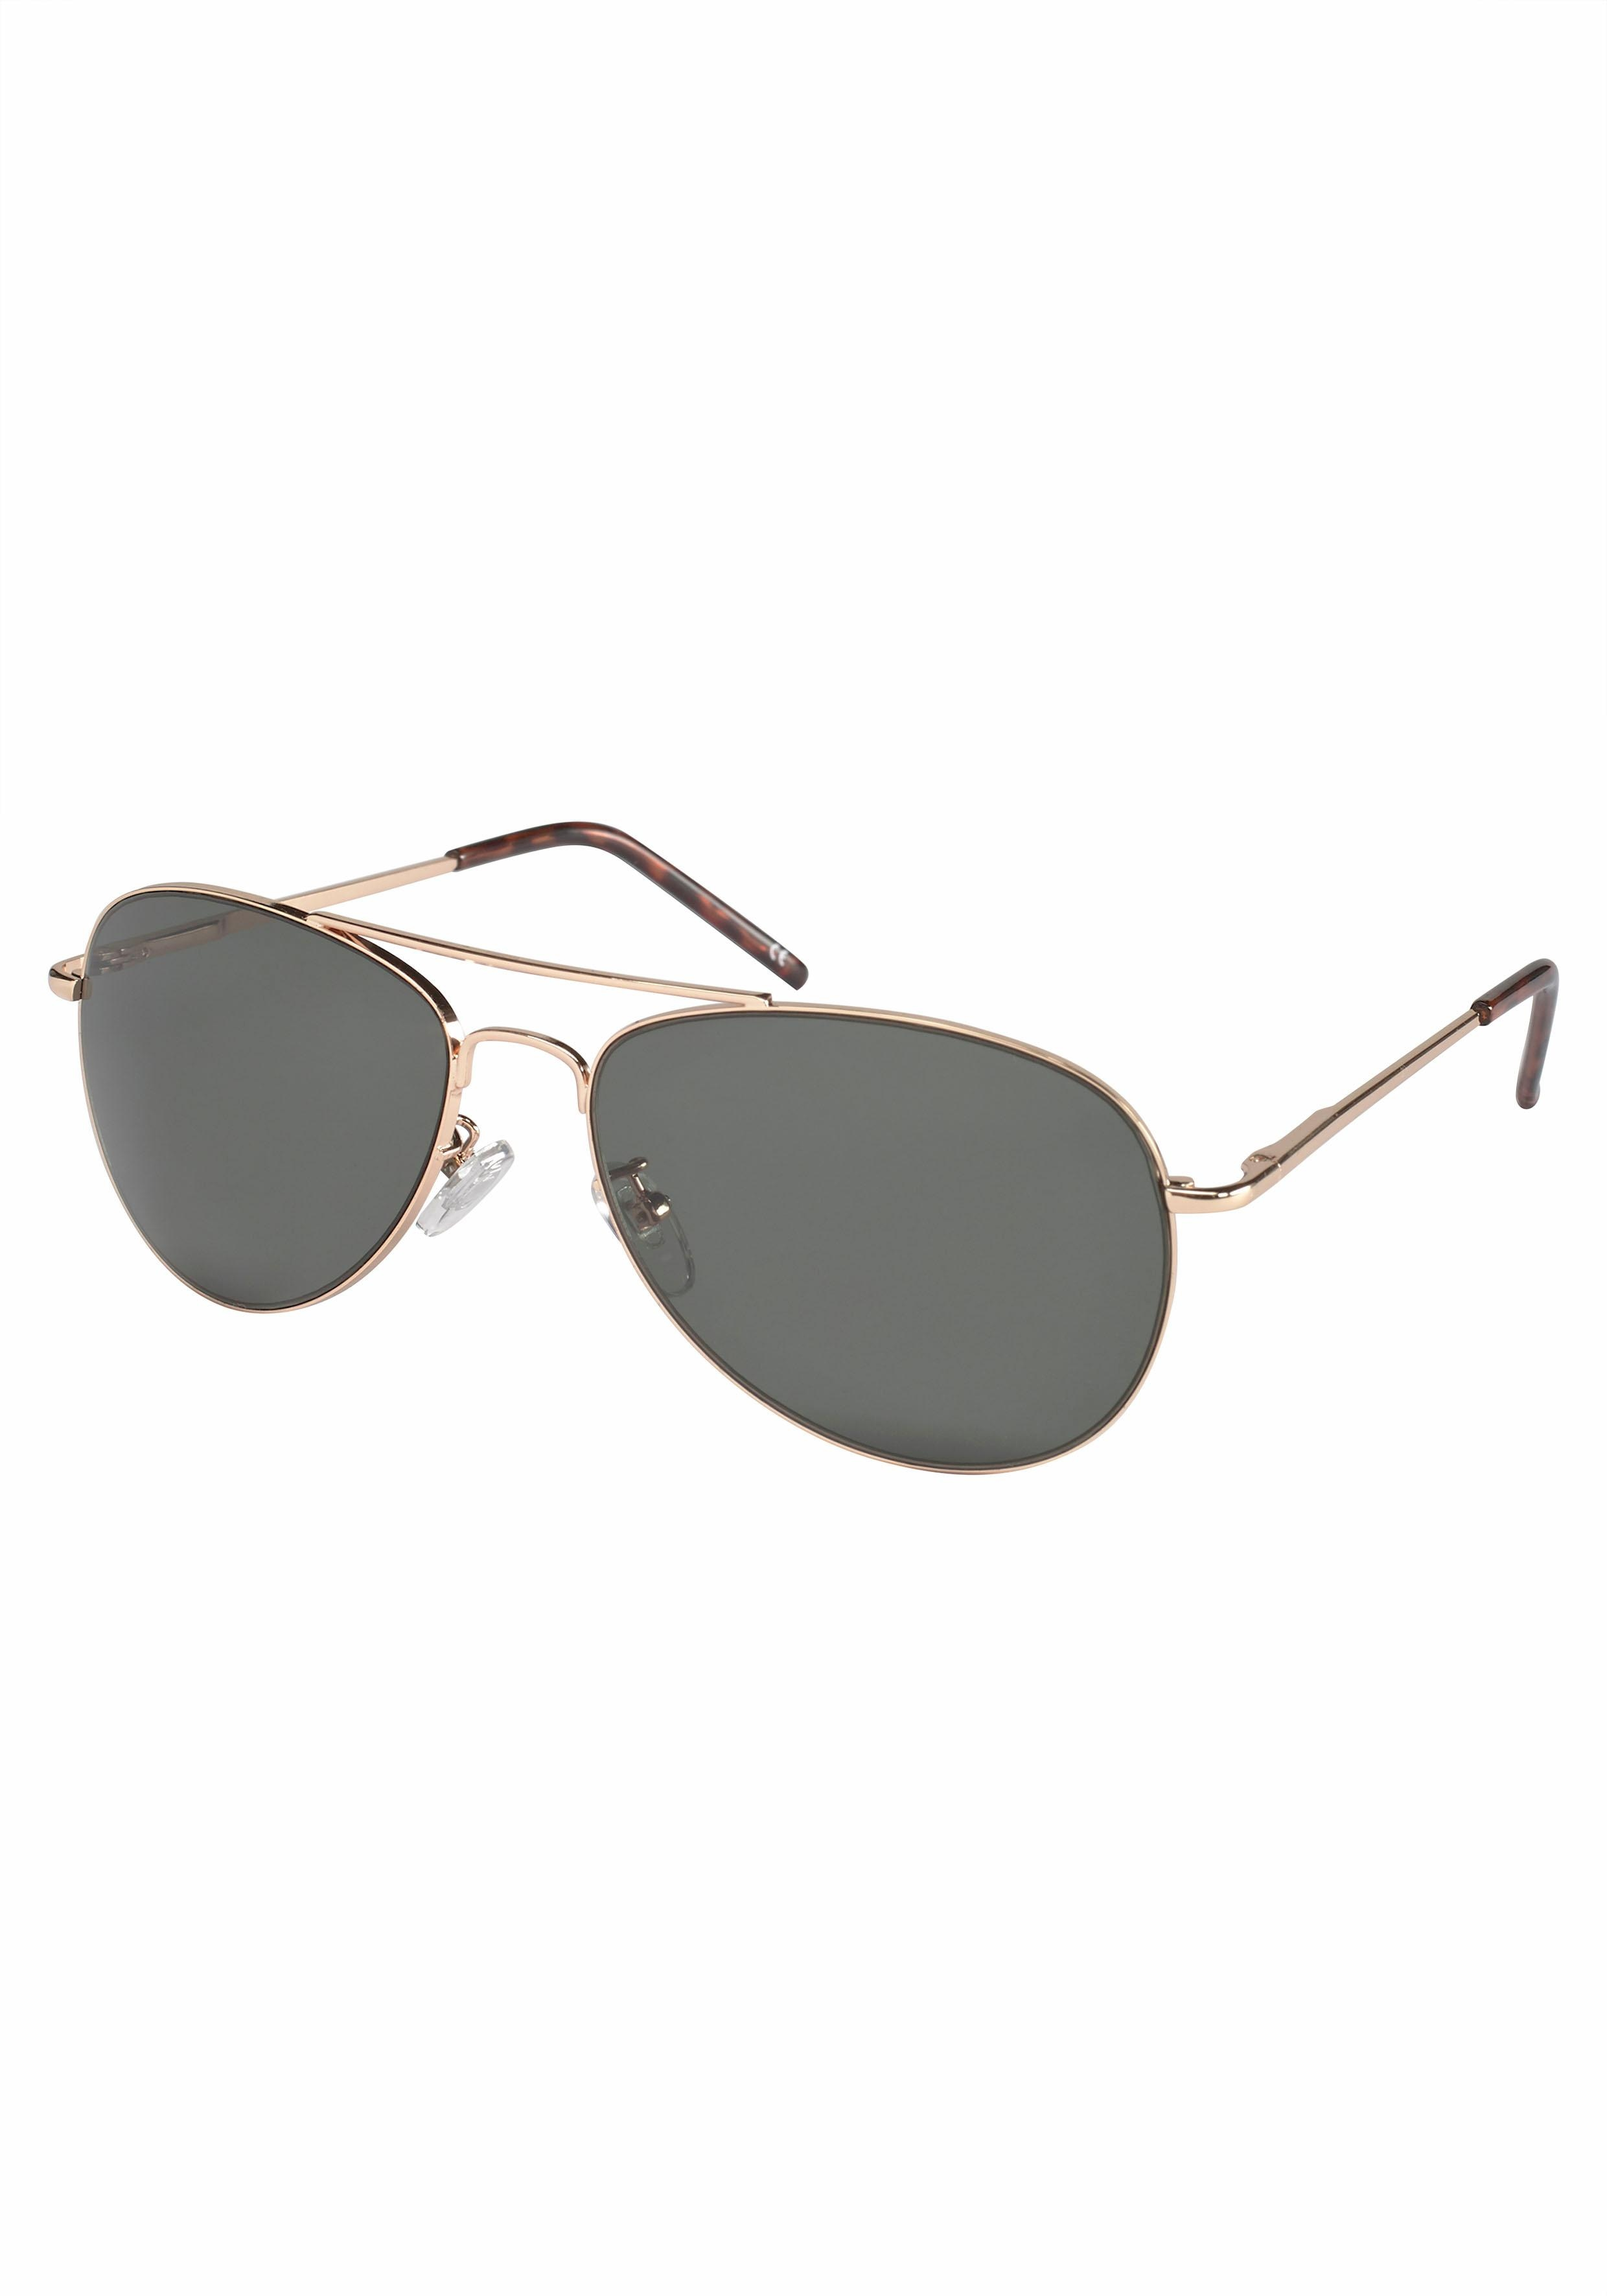 Image of PRIMETTA Eyewear Sonnenbrille